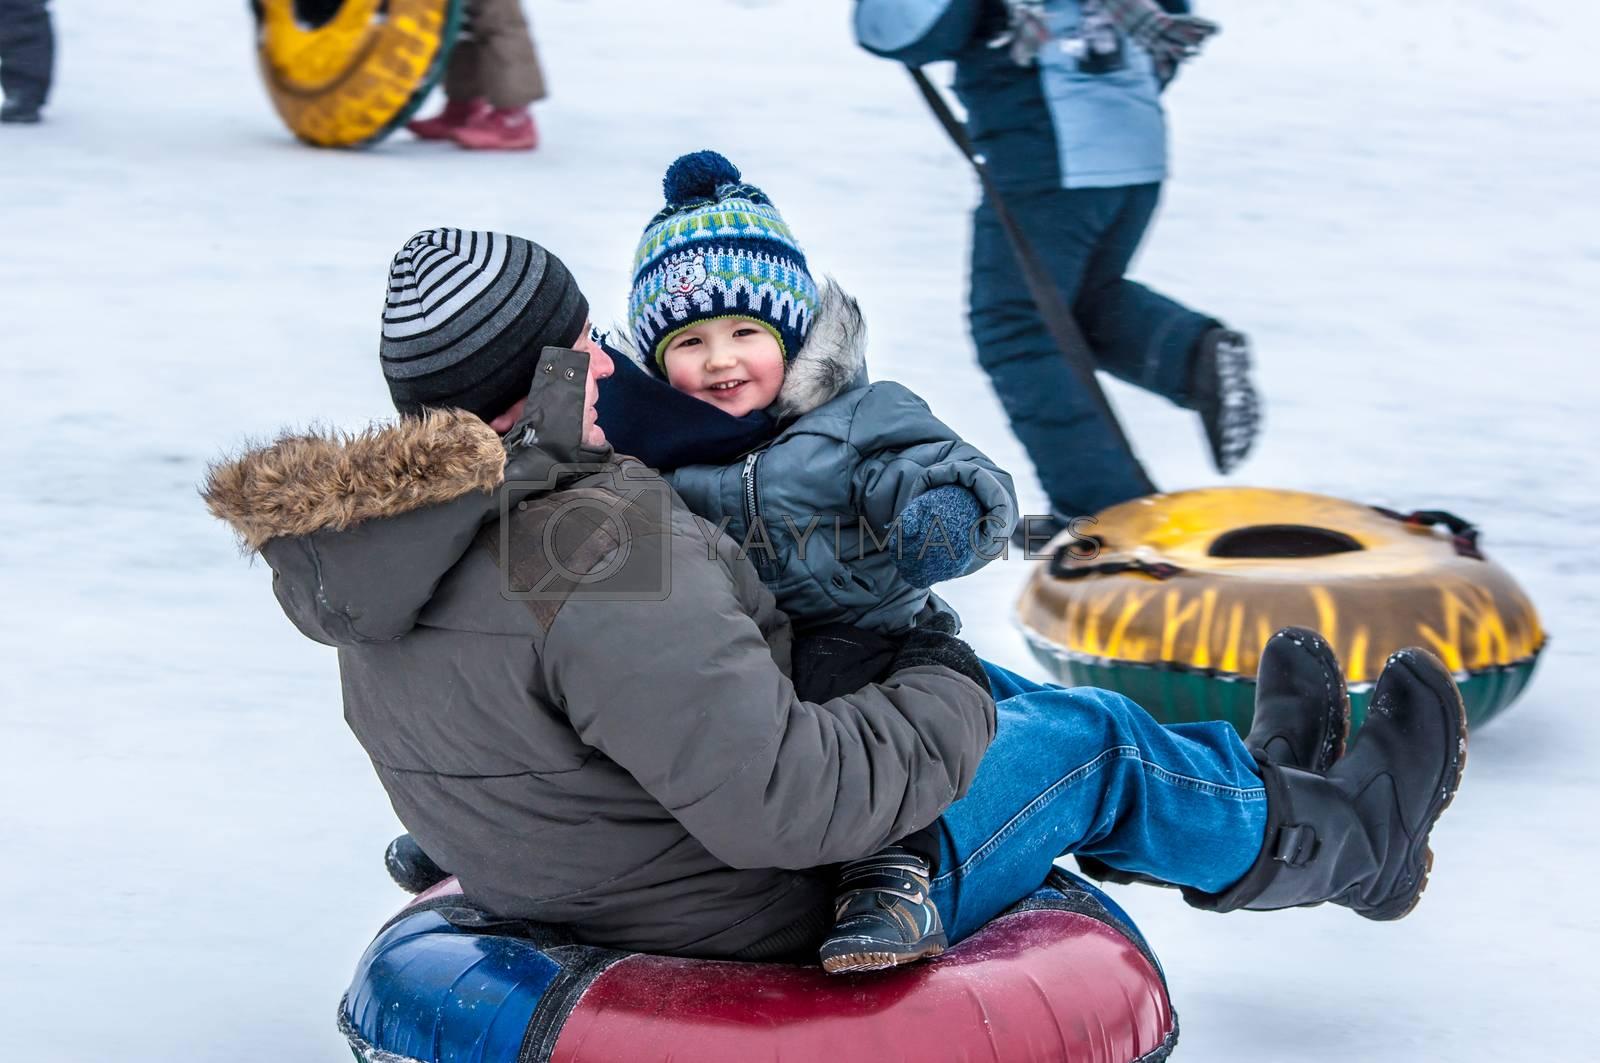 Orenburg, Orenburg region, Russia - 18 January 2015: Baby winter sledding on the Ural River